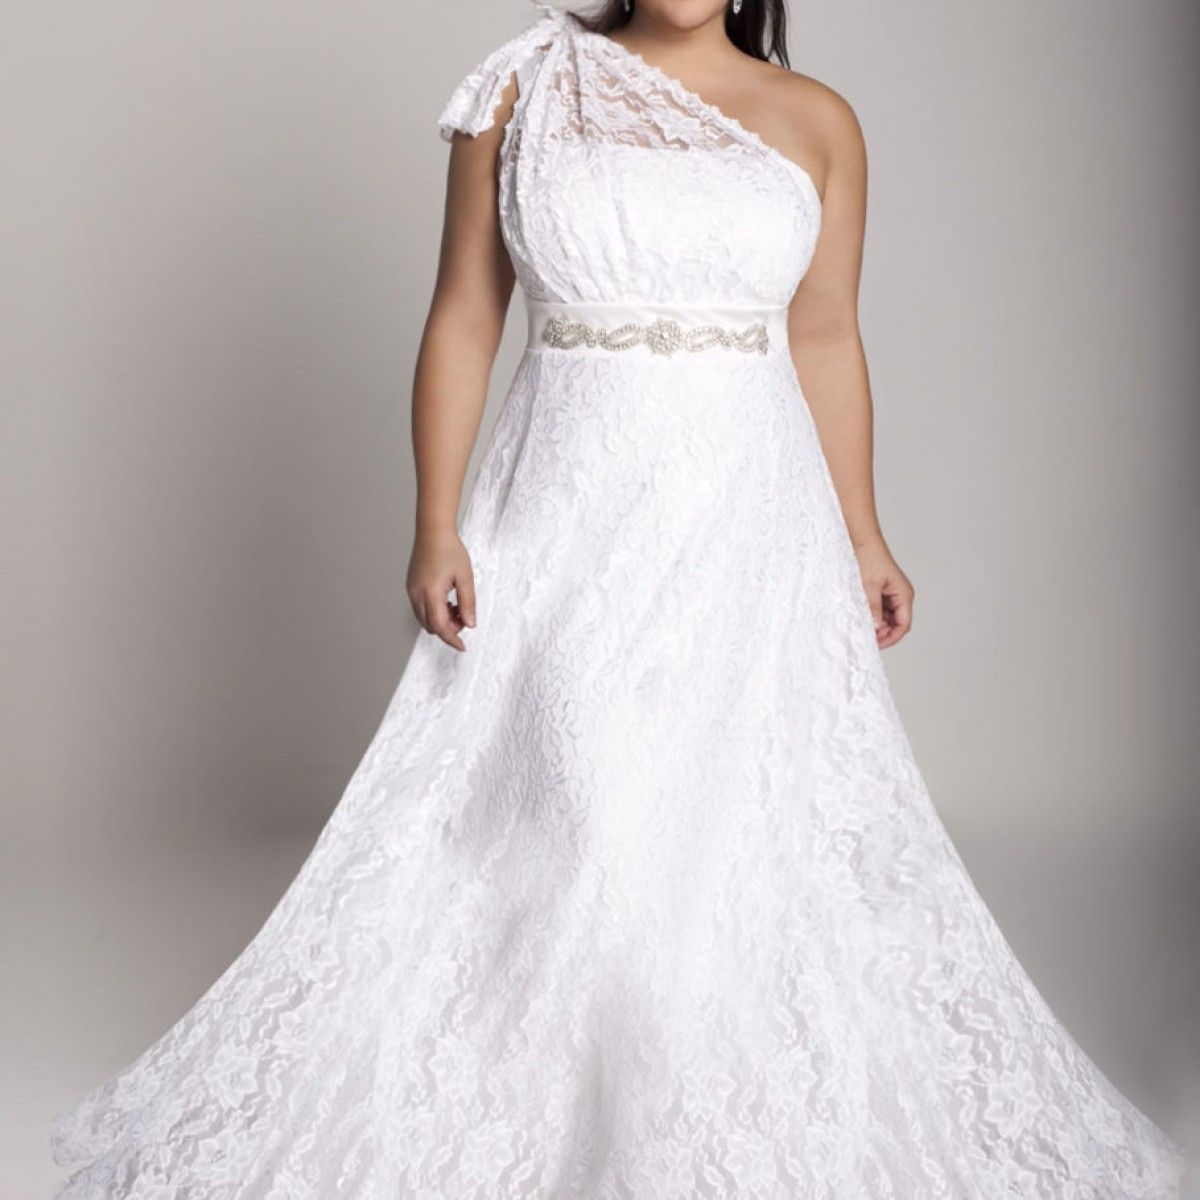 Macys Furniture San Diego: Macys Beach Wedding Dresses